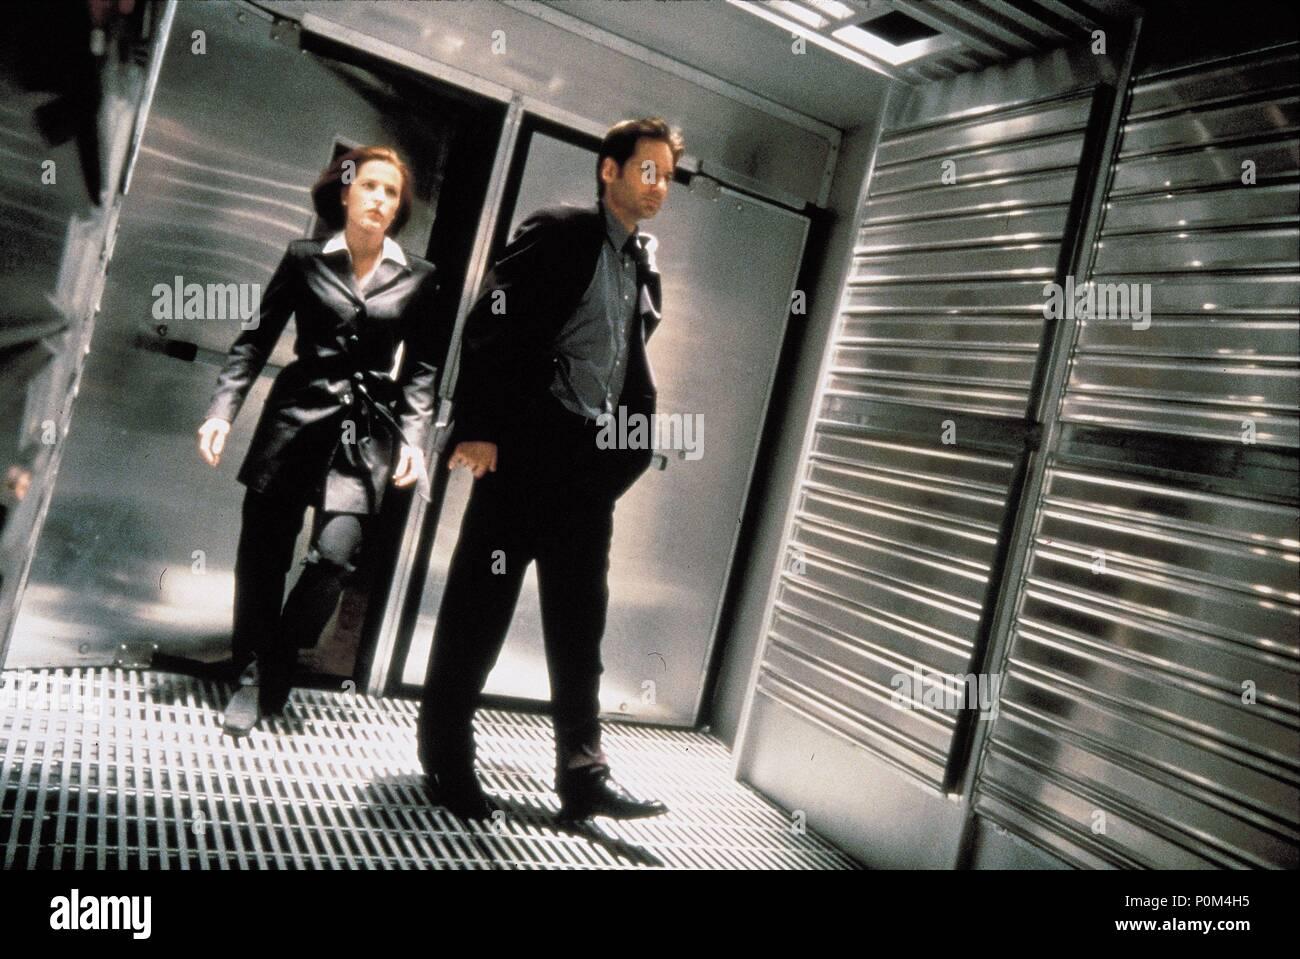 Original Film Title: X-FILES, THE.  English Title: X-FILES, THE.  Film Director: ROB BOWMAN.  Year: 1998.  Stars: DAVID DUCHOVNY; GILLIAN ANDERSON. Credit: 20TH CENTURY FOX / MORTON, MERRICK / Album - Stock Image